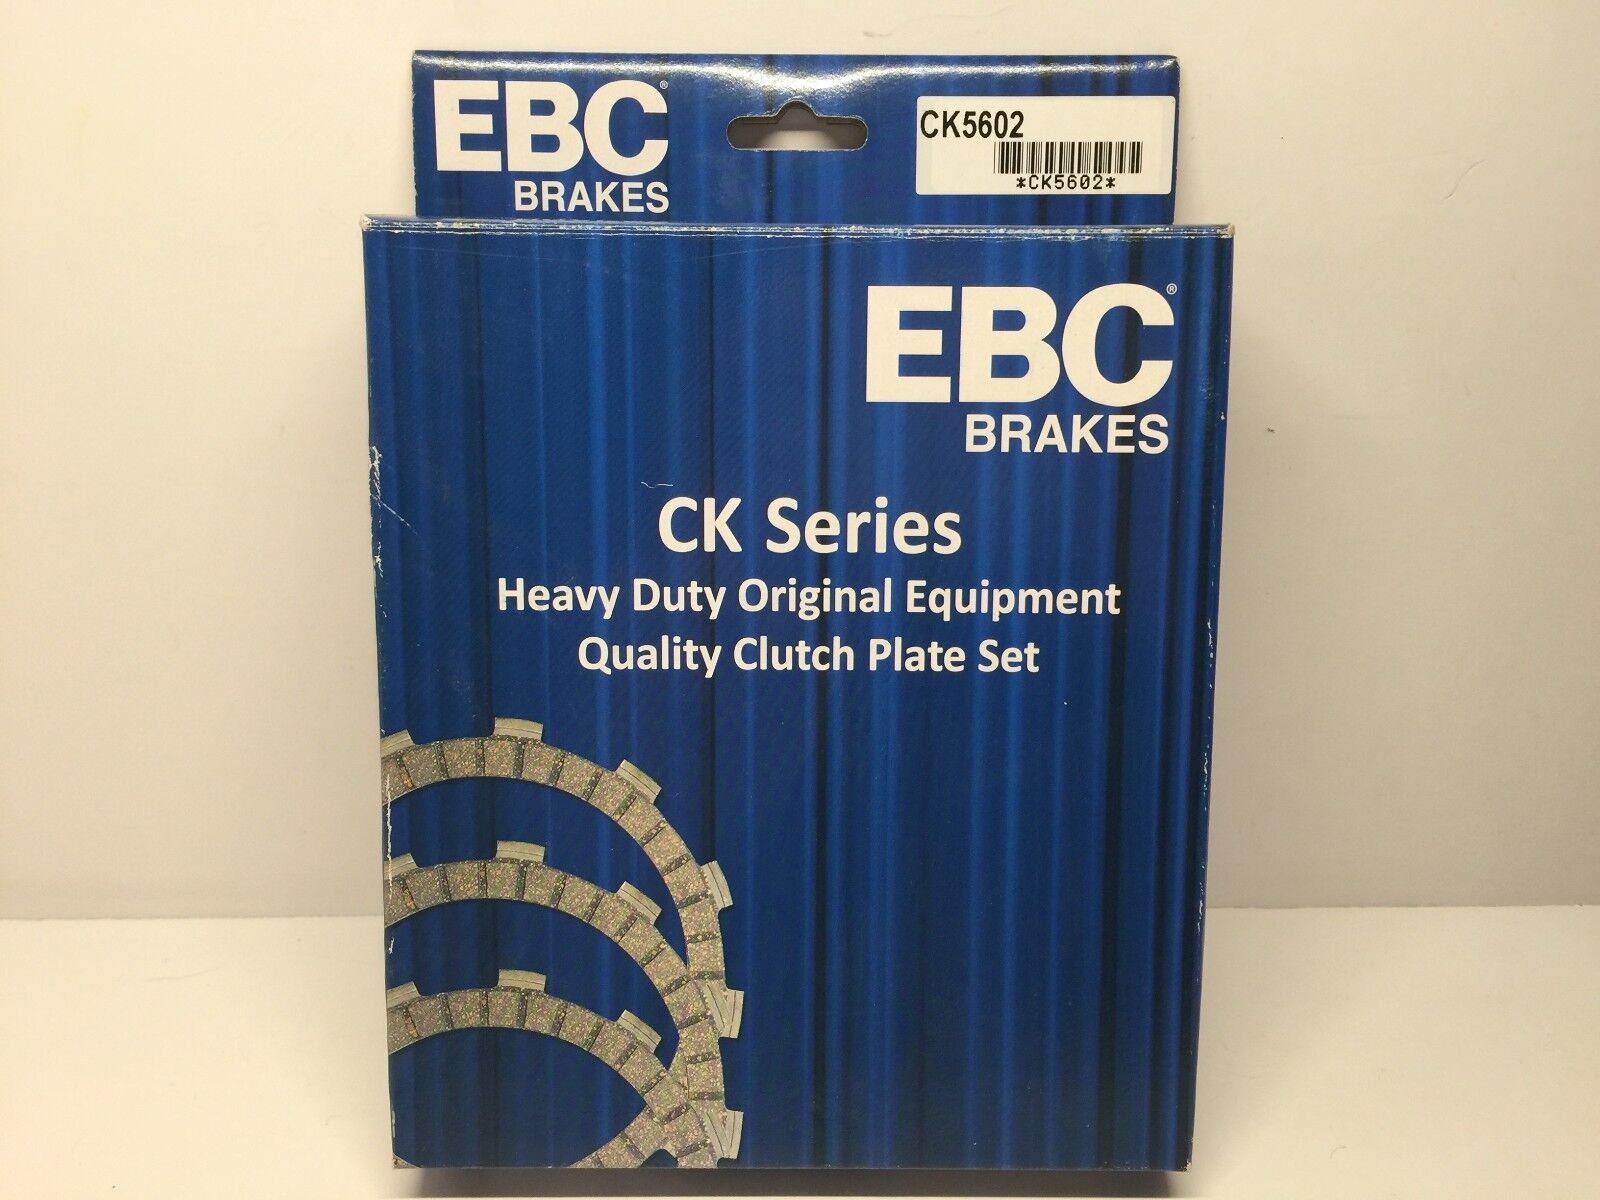 EBC Brakes CK1222 Clutch Friction Plate Kit